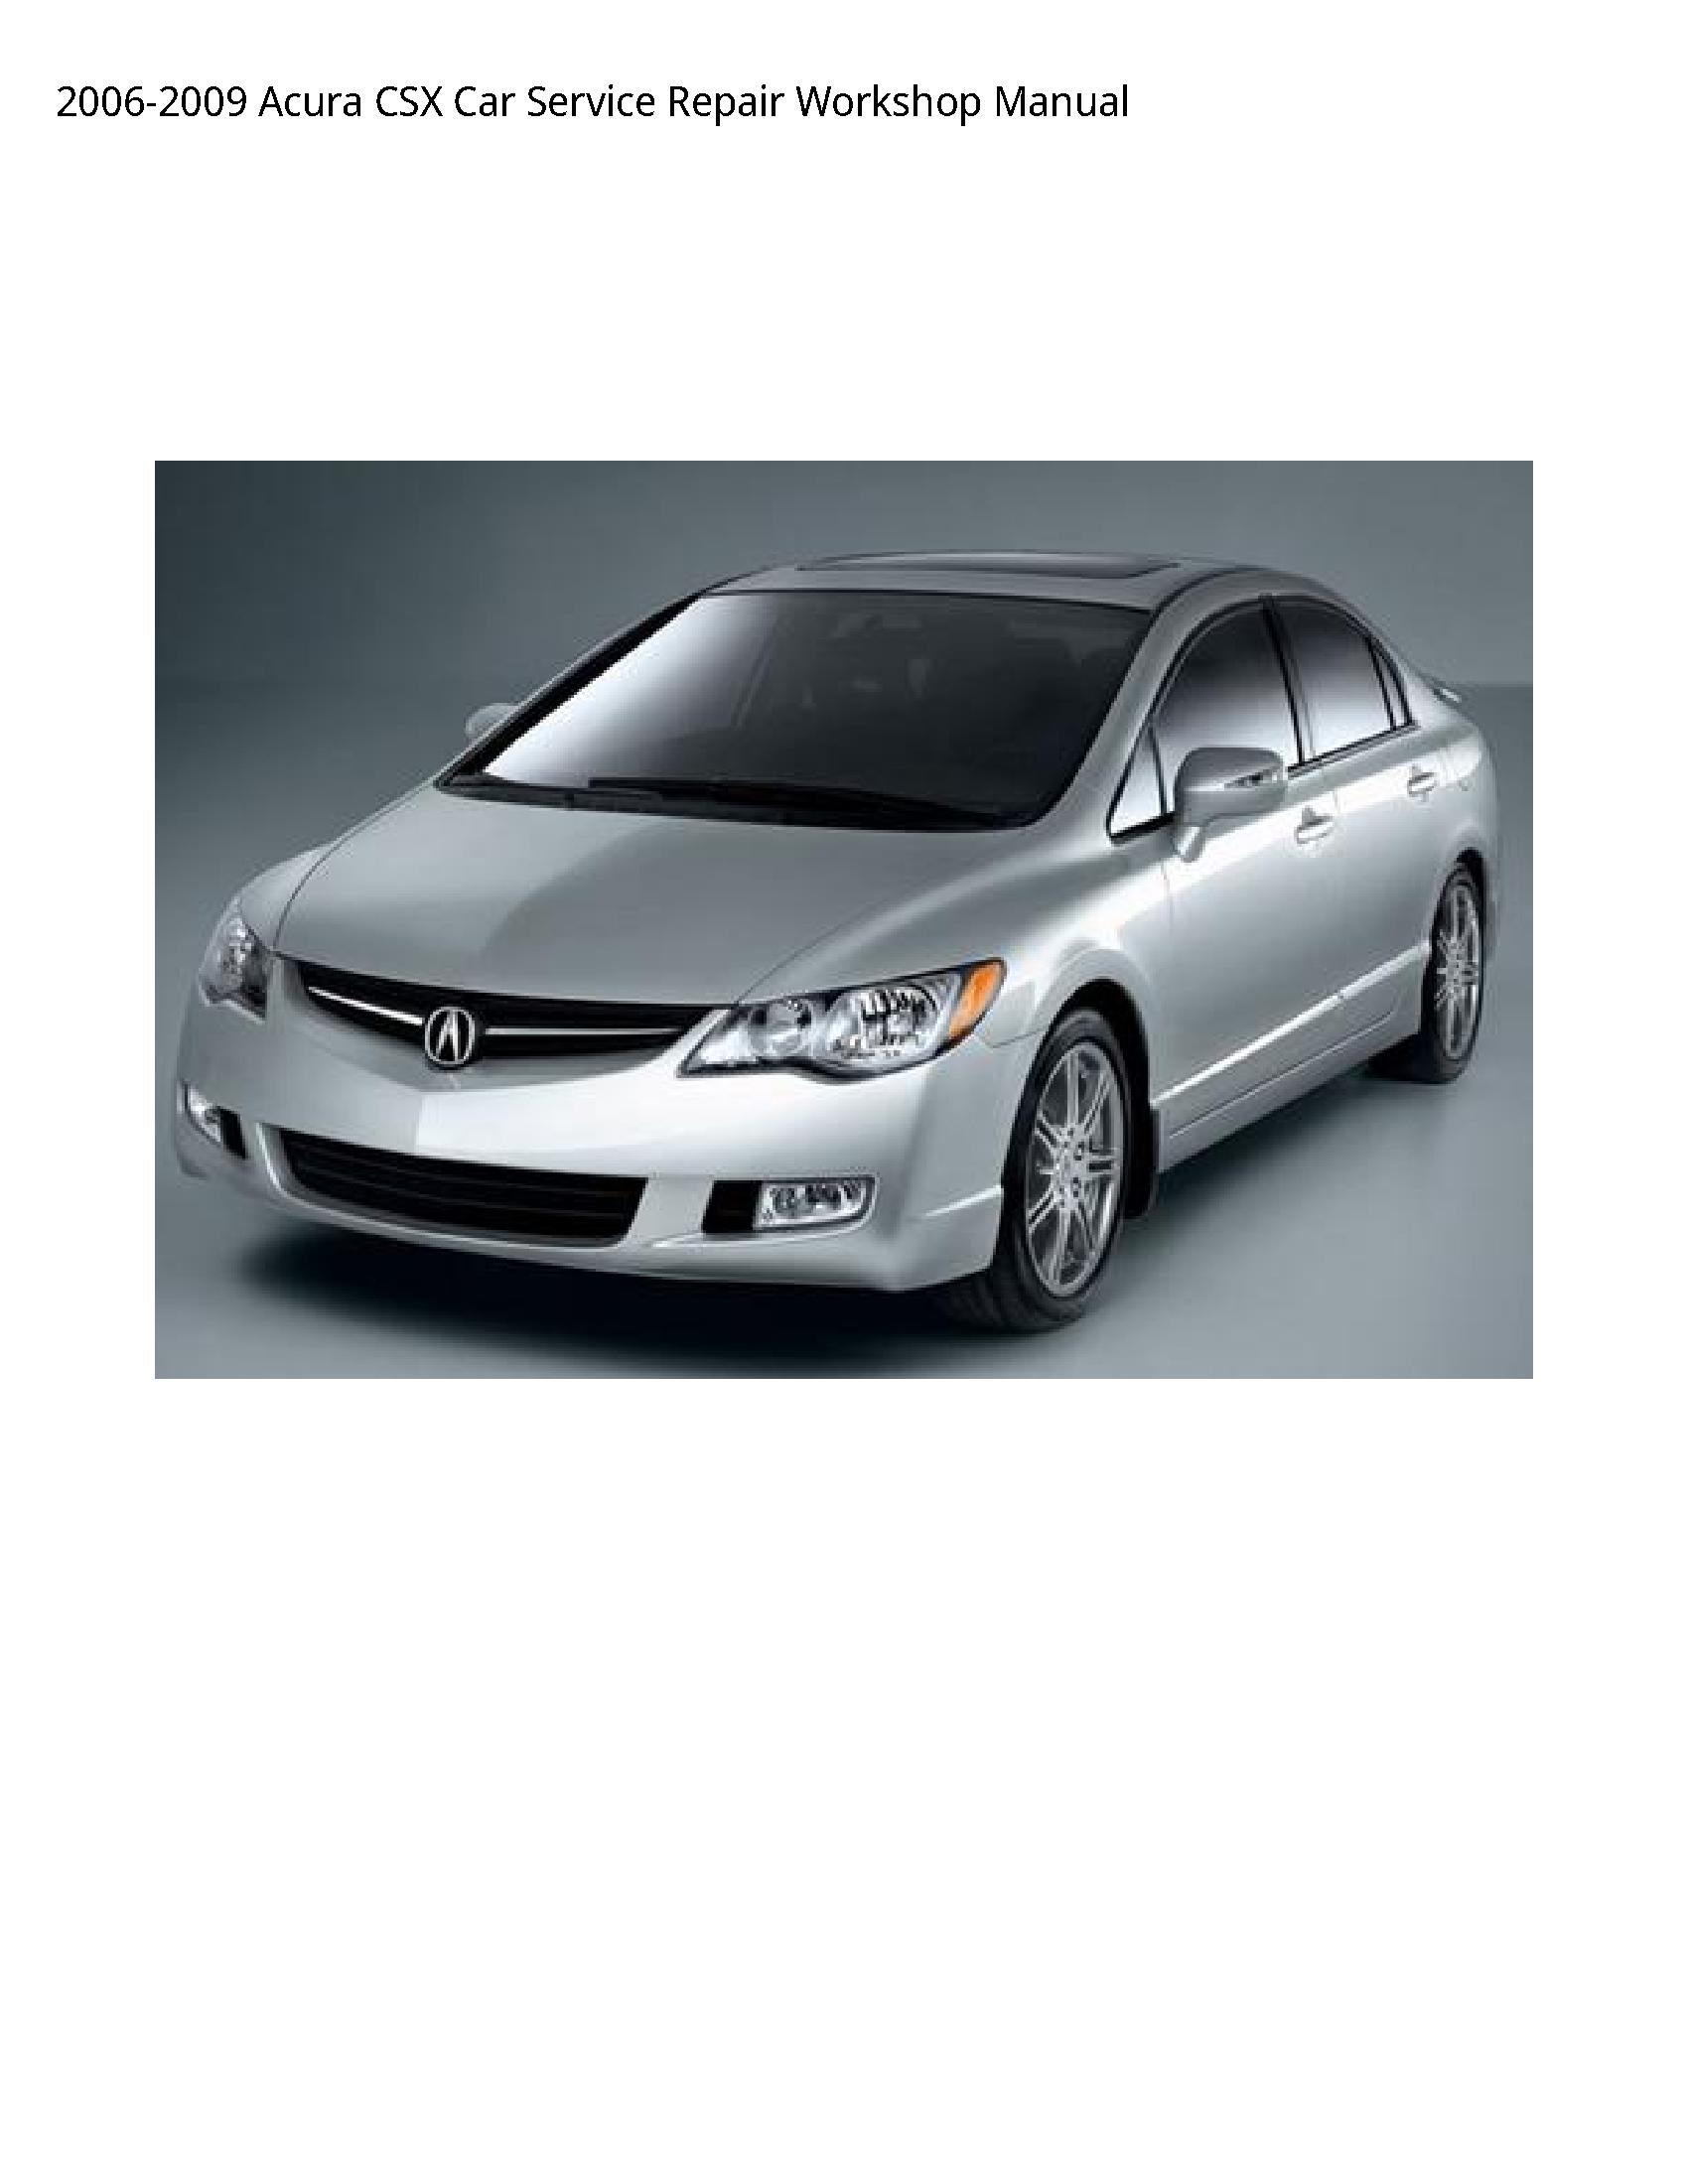 Acura CSX Car manual